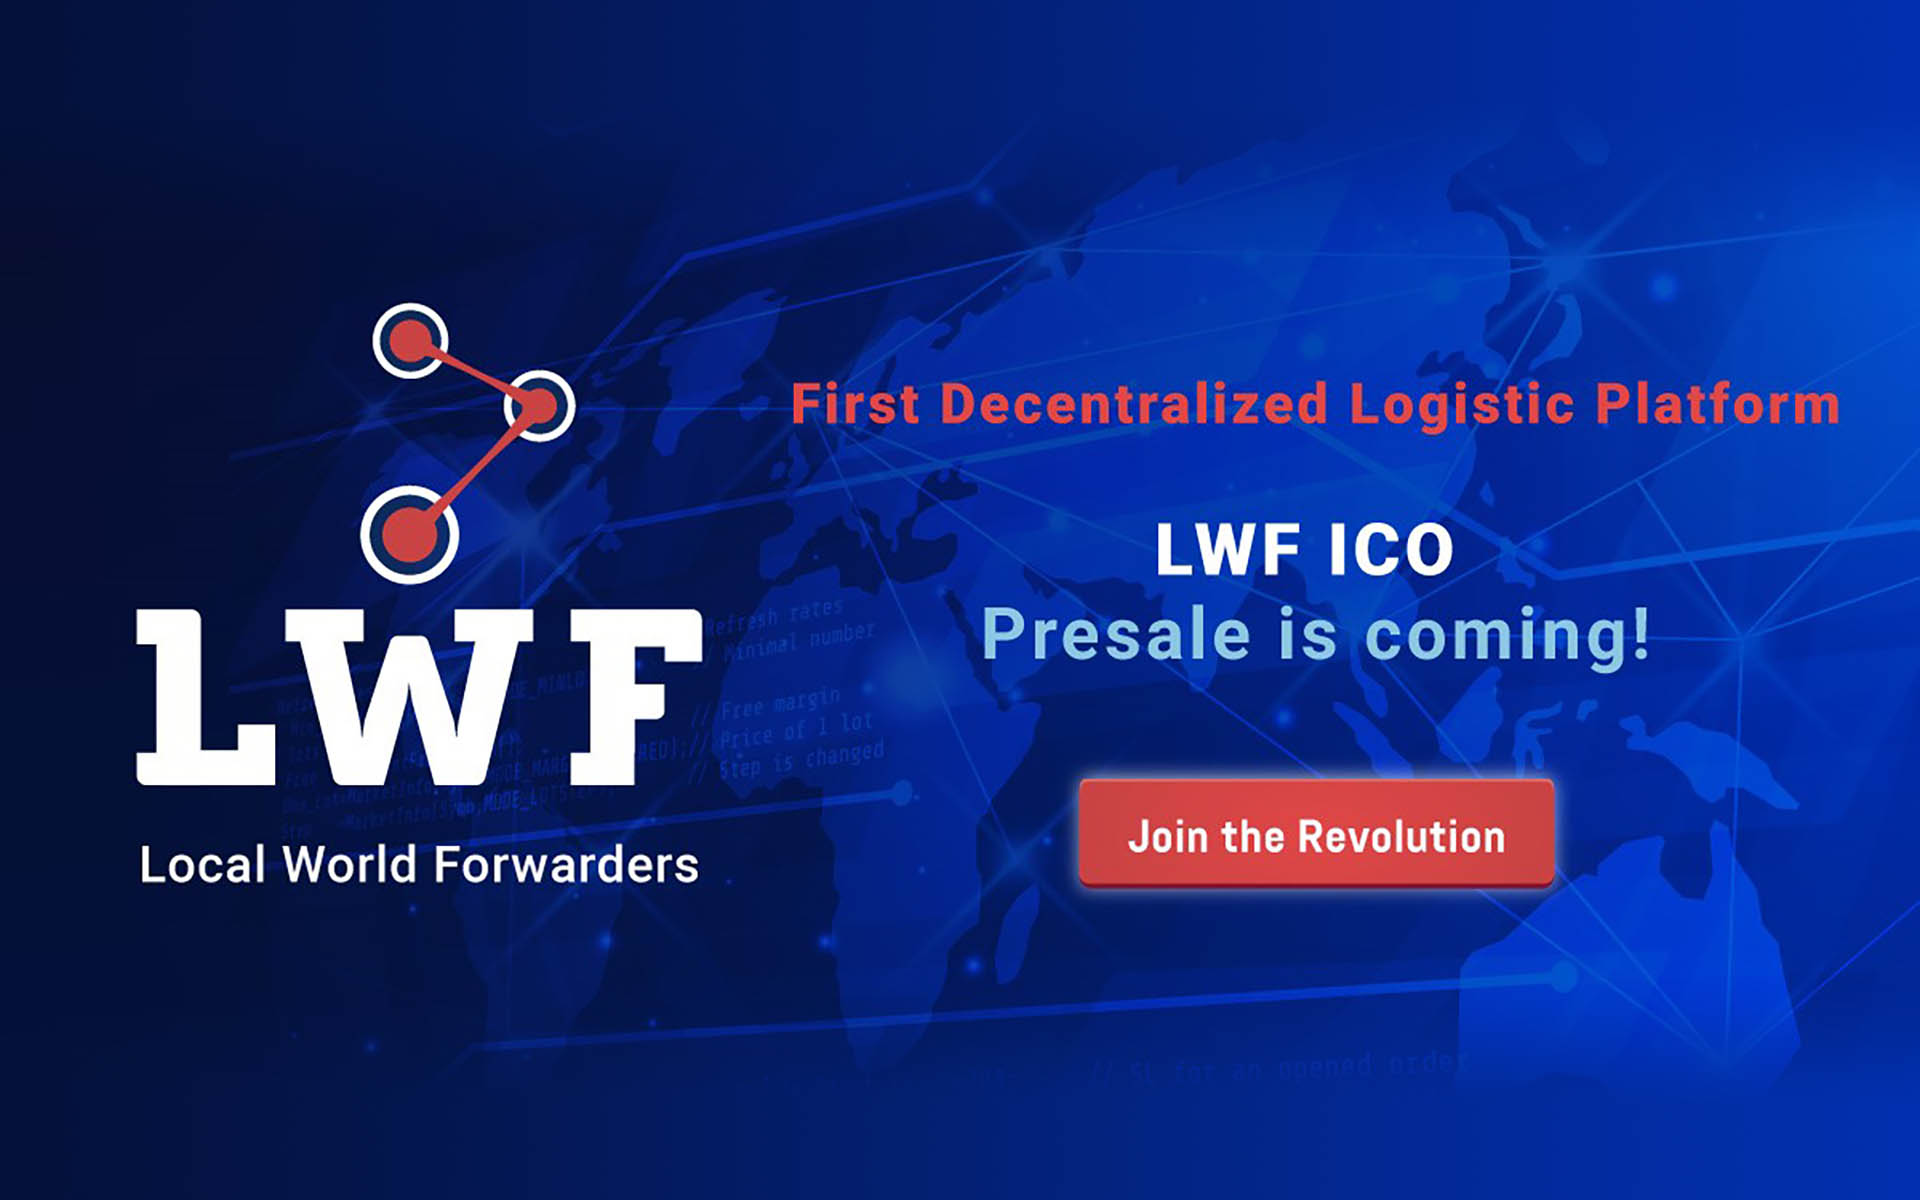 LWF Announces Upcoming ICO Presale